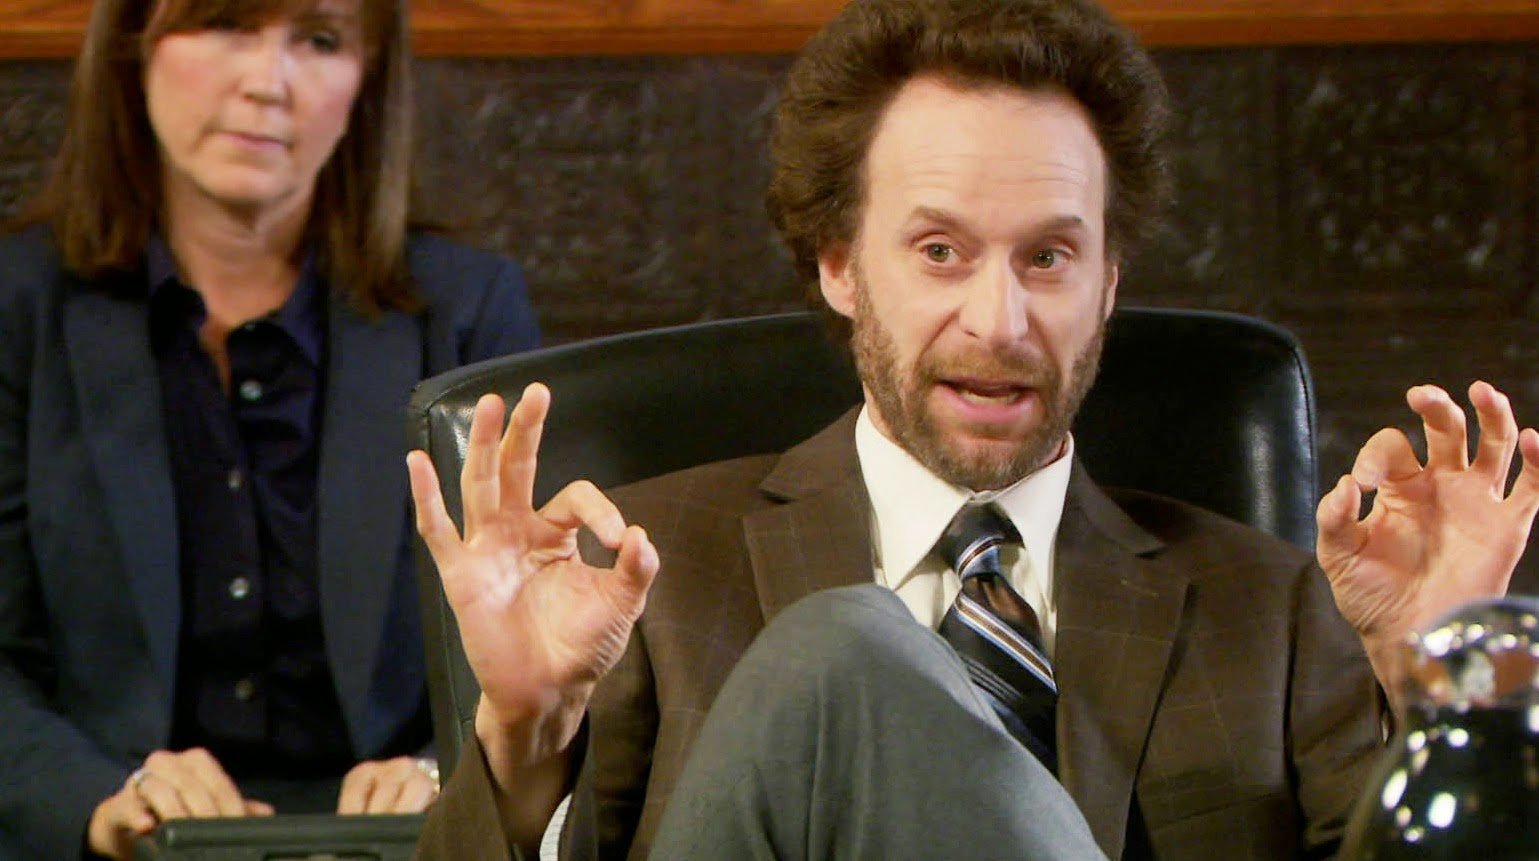 Jeremy Jamm 10 sitcom characters who would make amazing supervillains